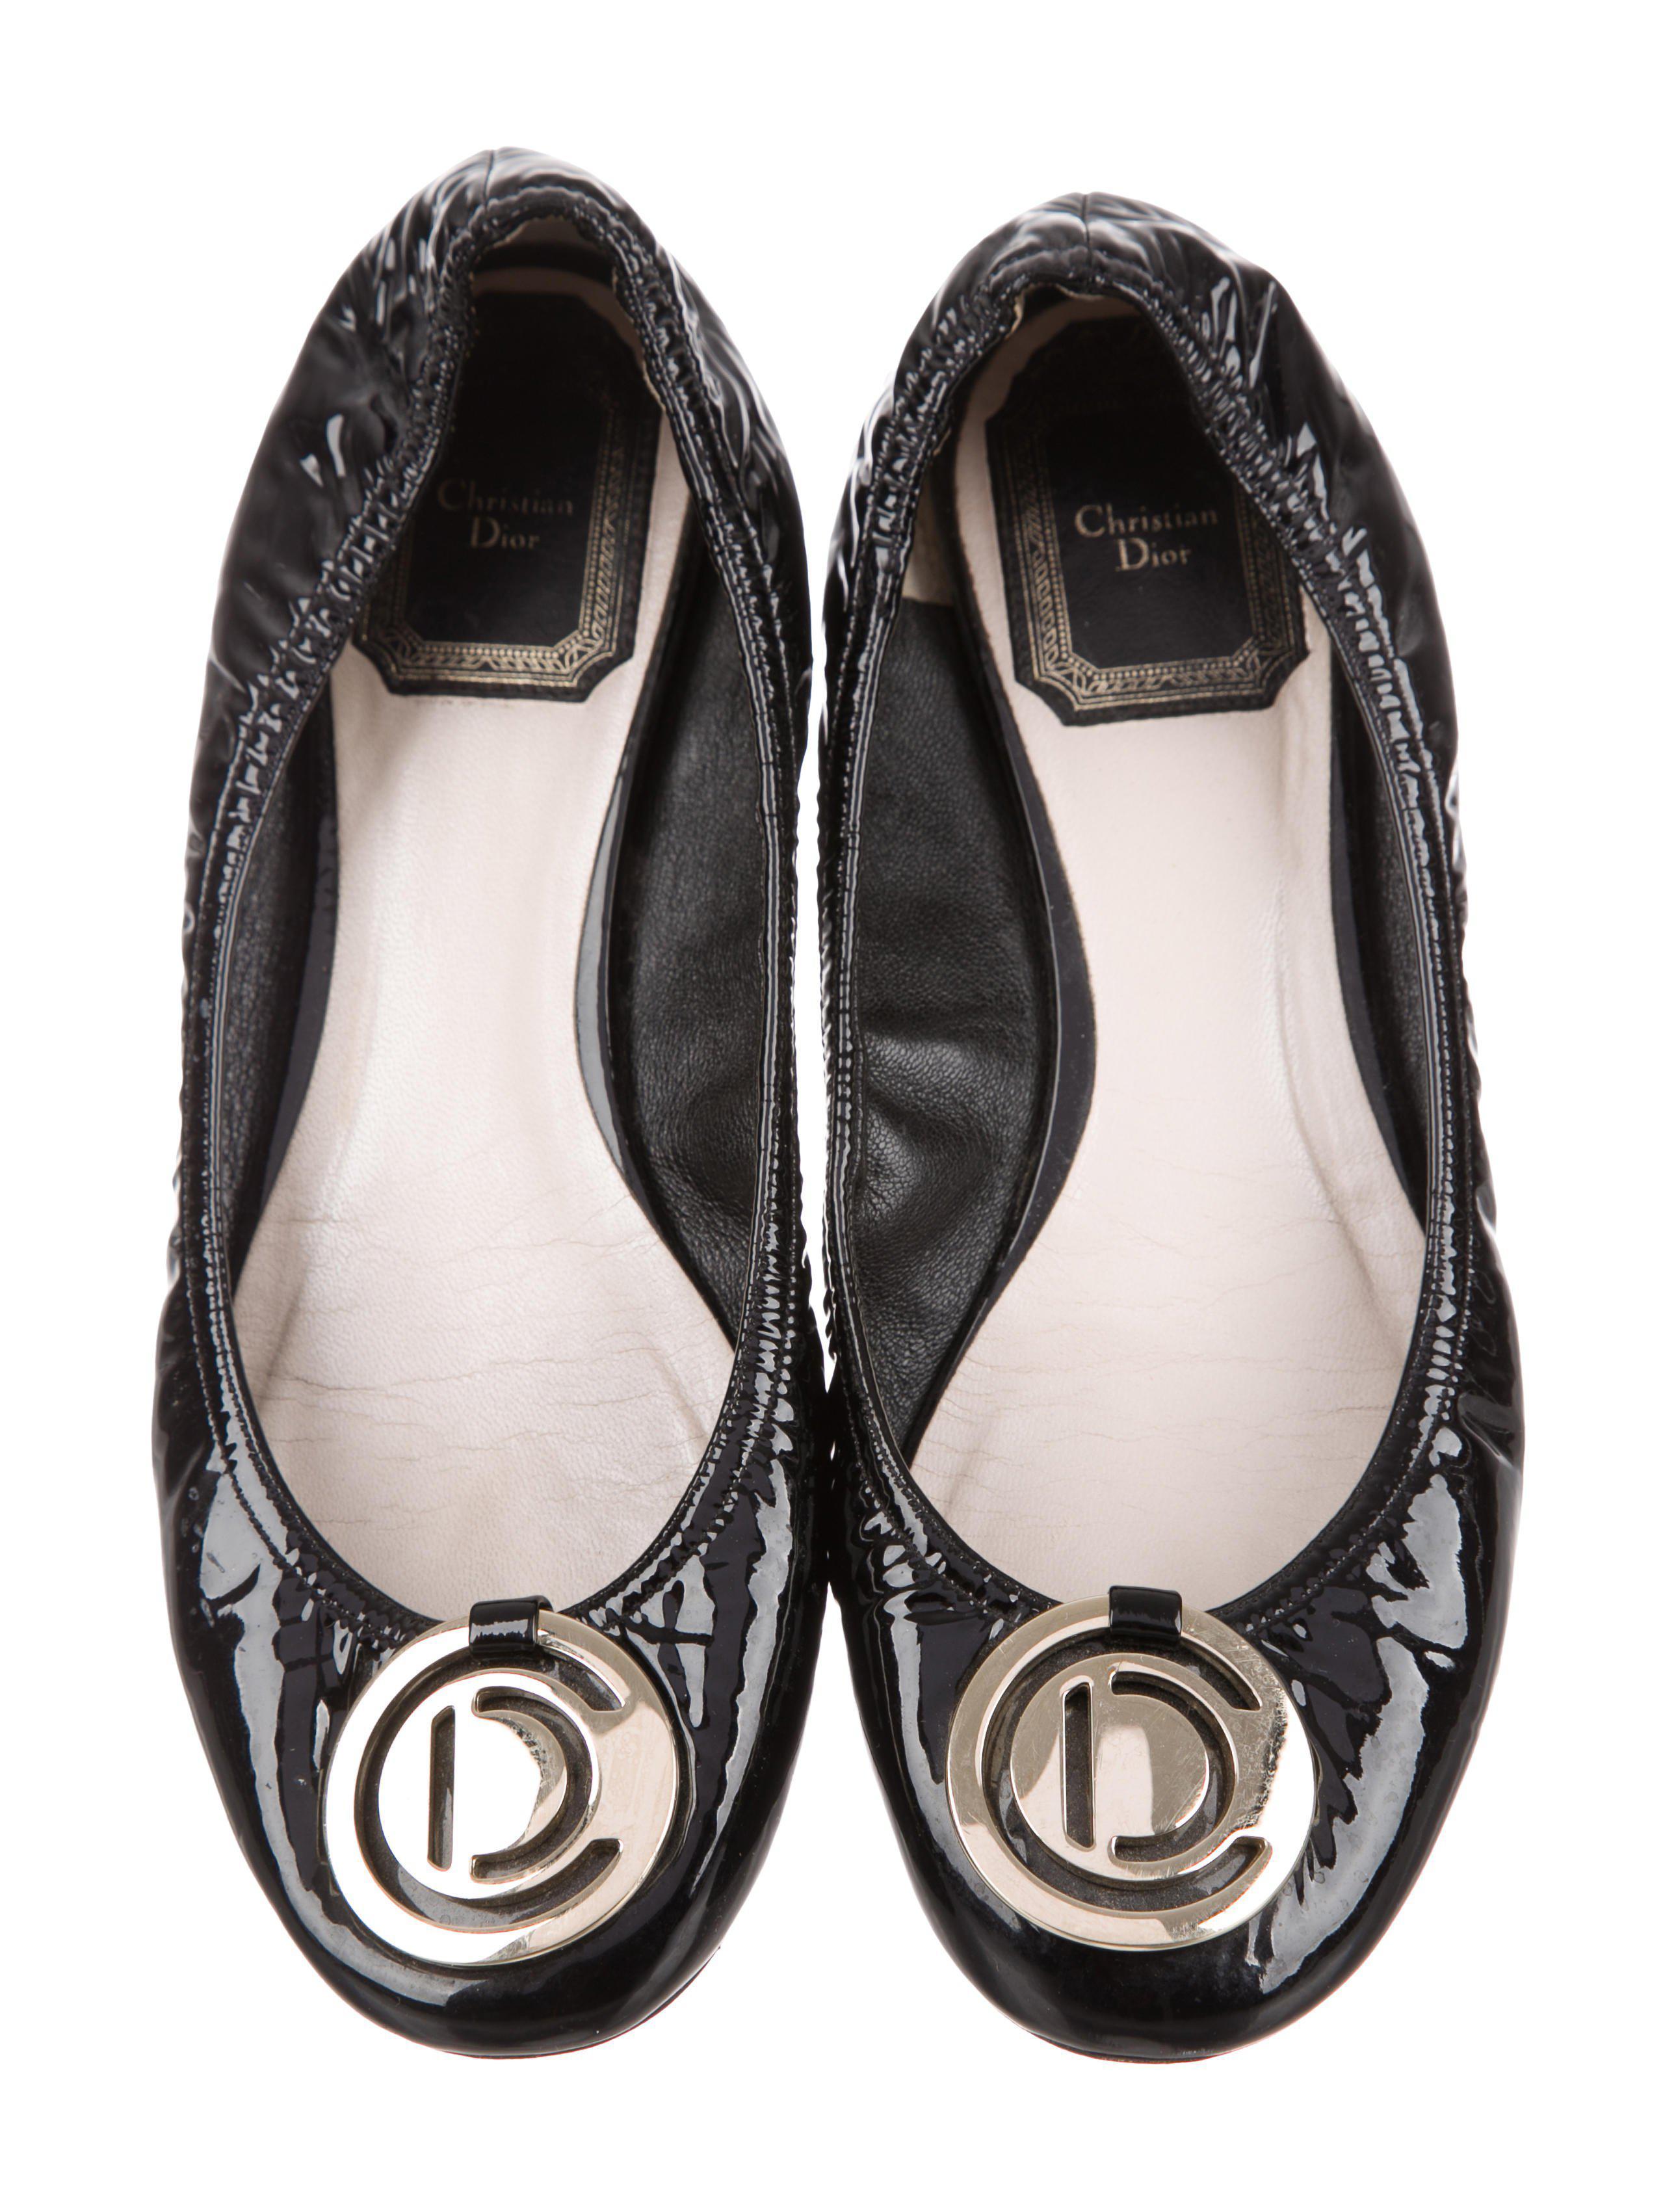 7727d6f2f Lyst - Dior Patent Leather Round-toe Flats Black in Metallic